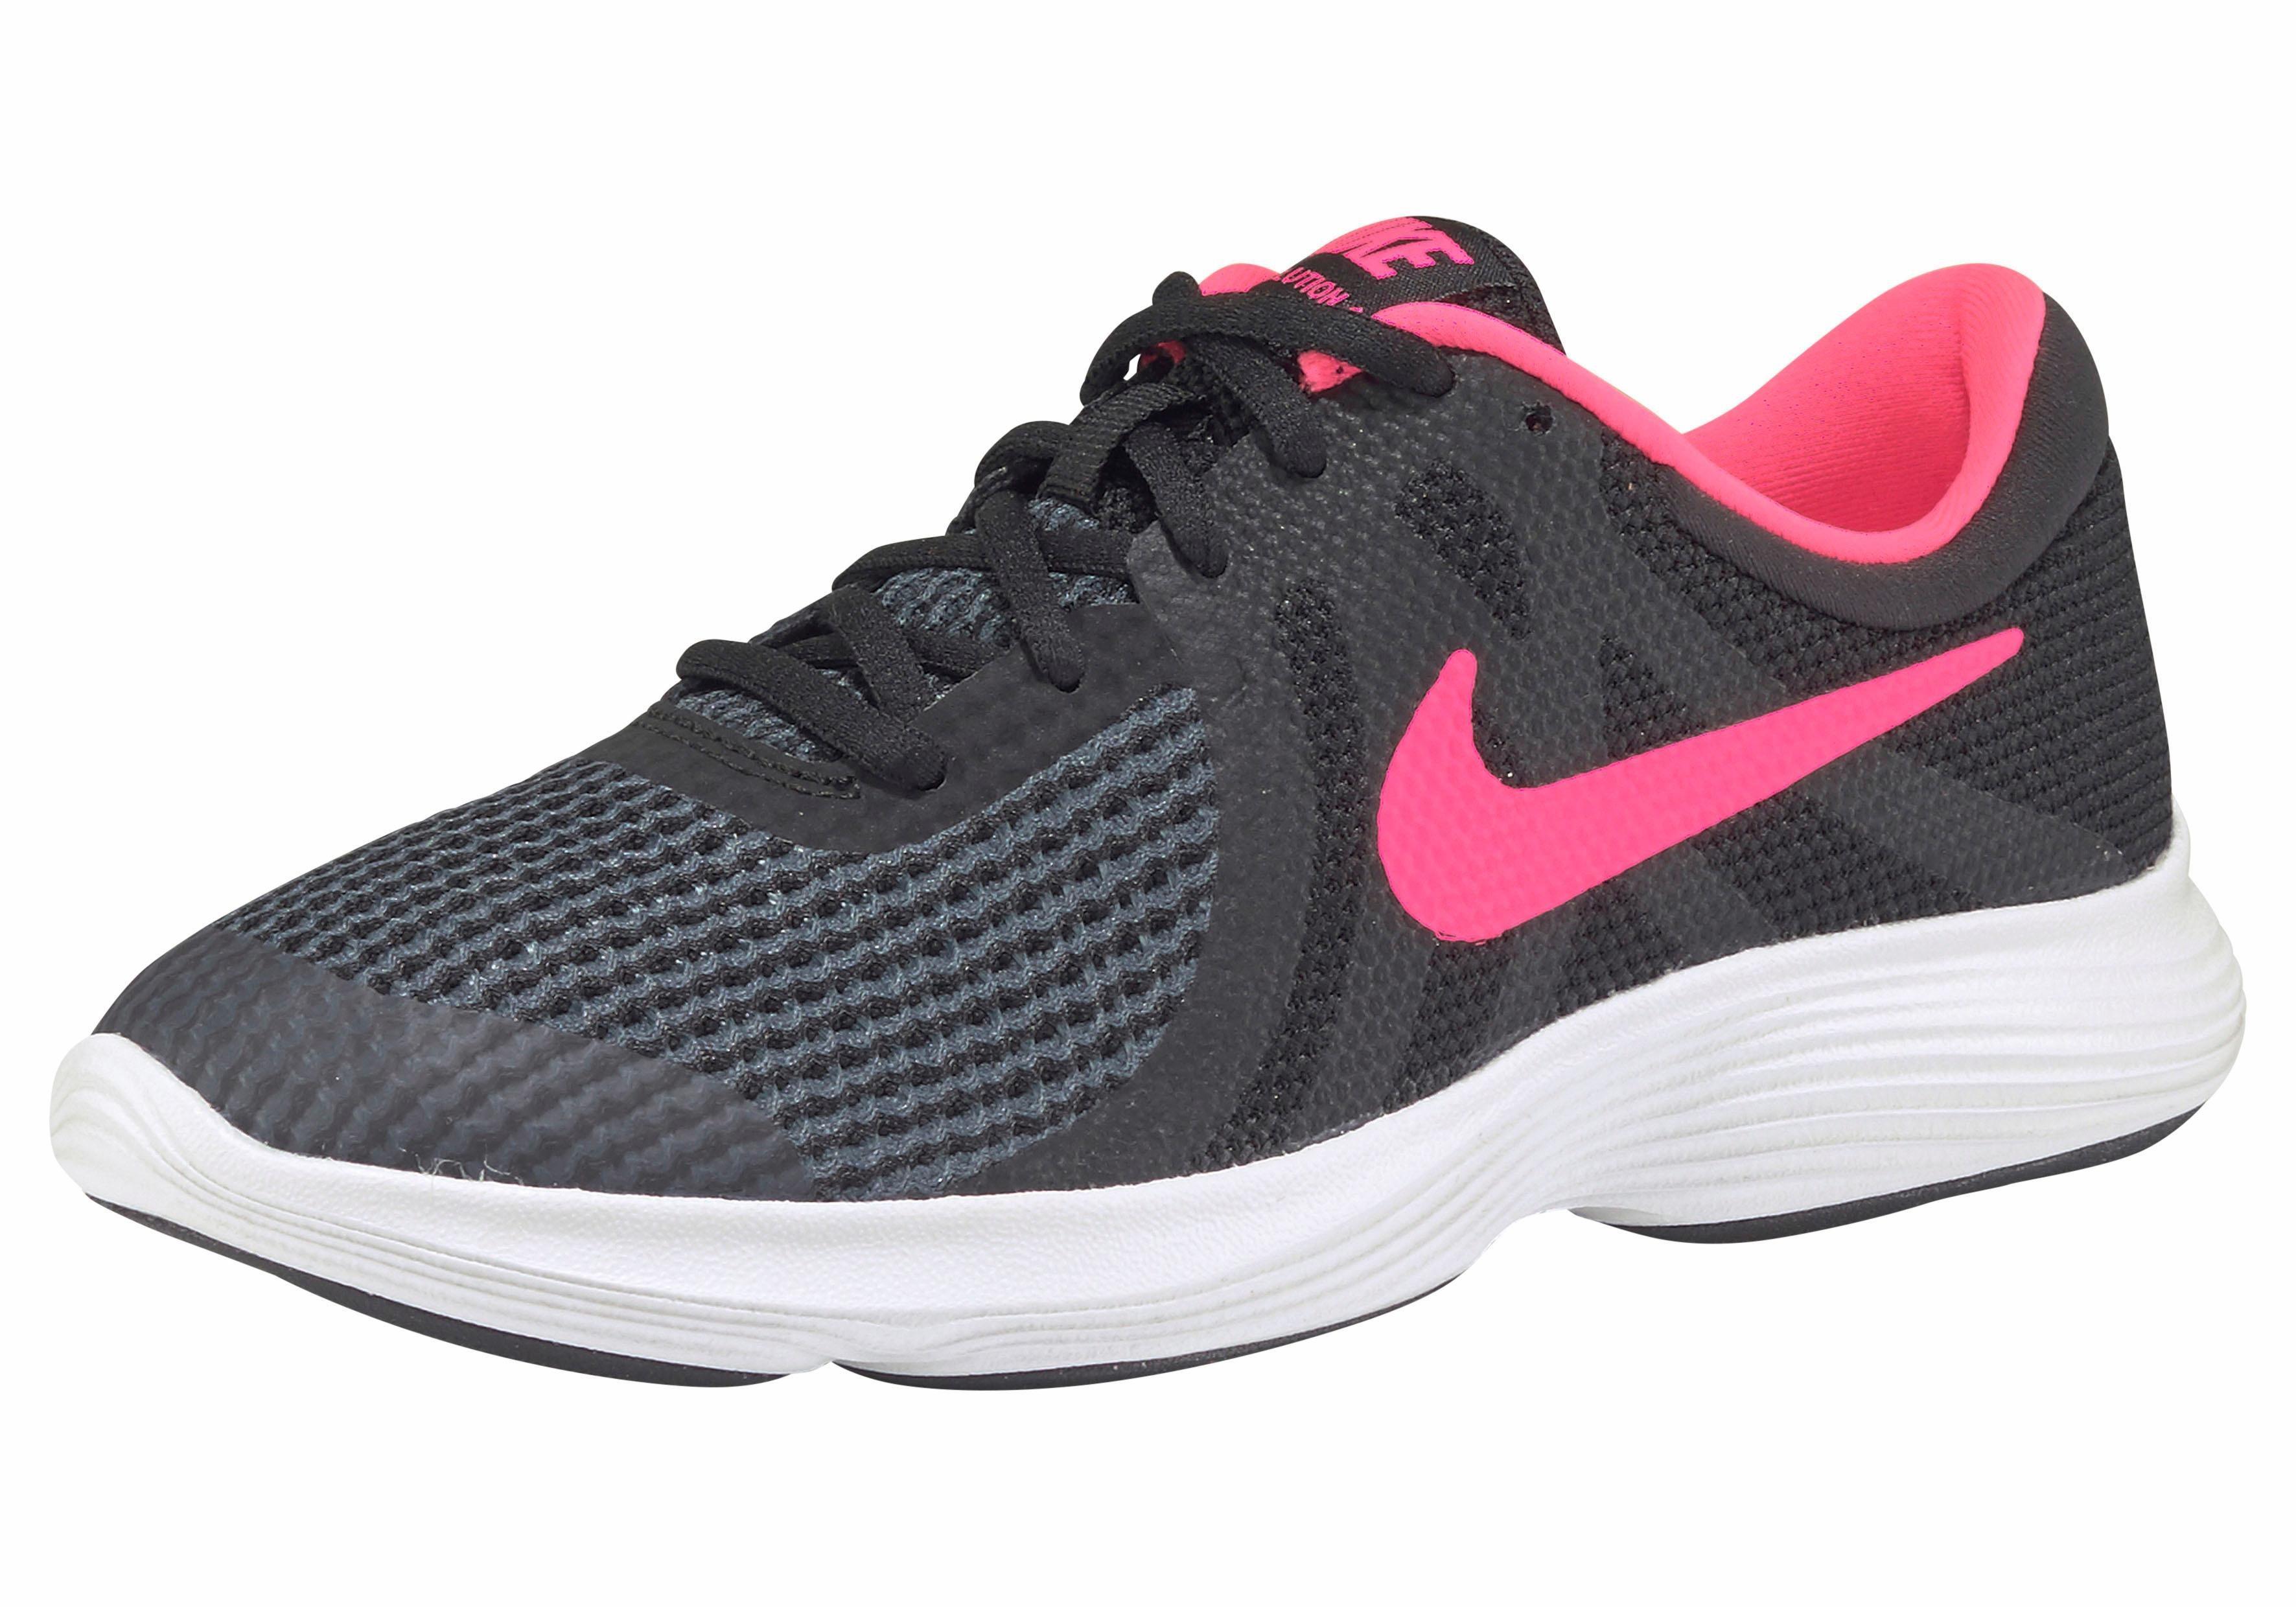 39c8e8cc38 Nike futócipő »Revolution 4 (GS)« - Glami.hu